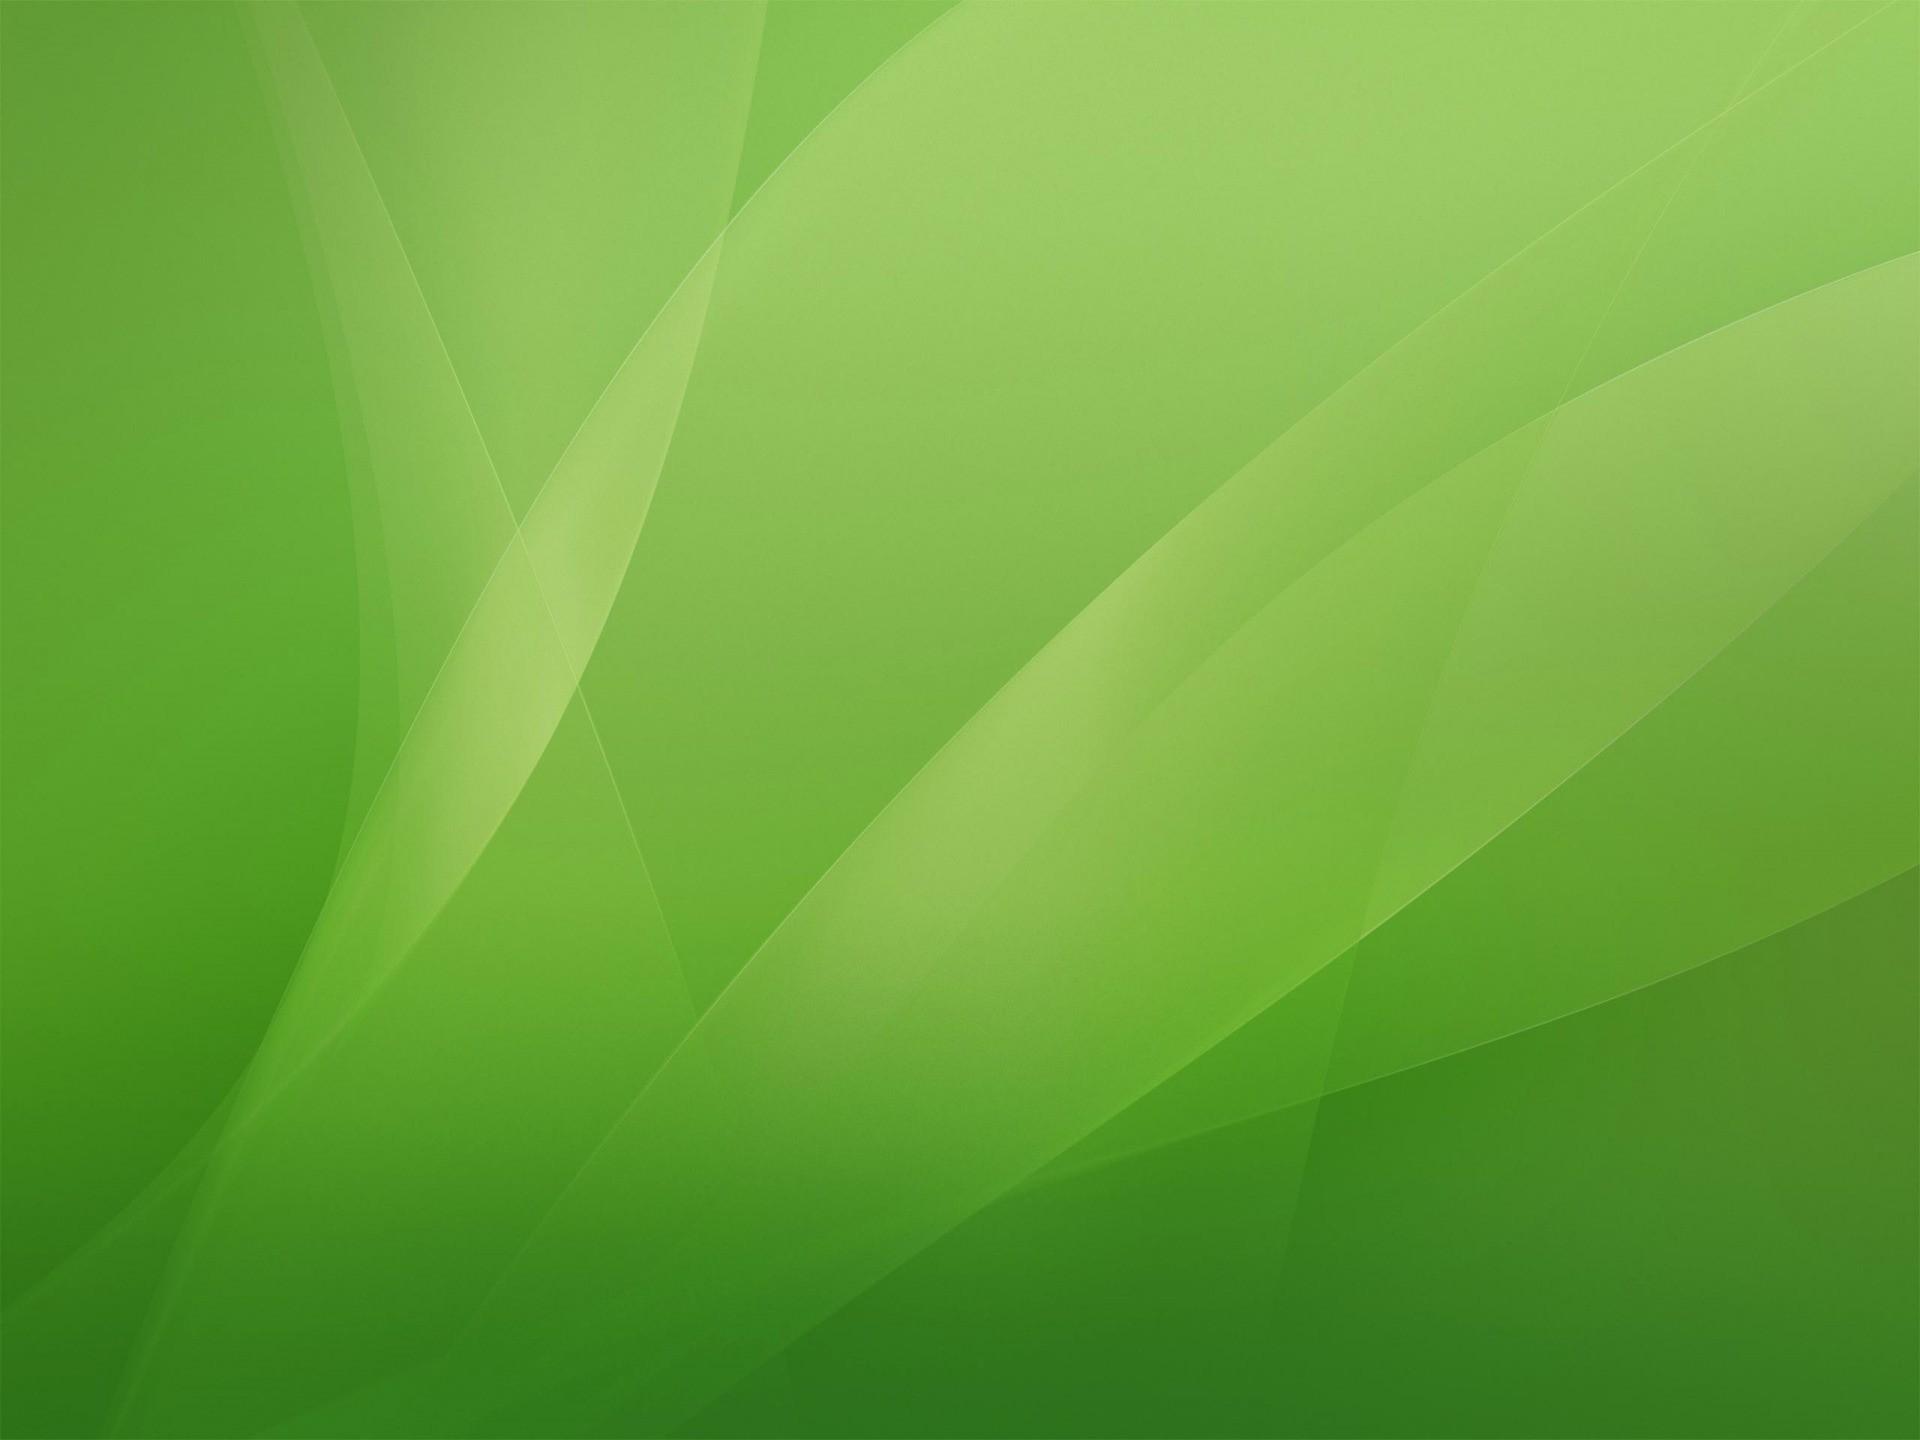 1080x1920 Light Green Chevron IPhone 6 Plus Wallpaper